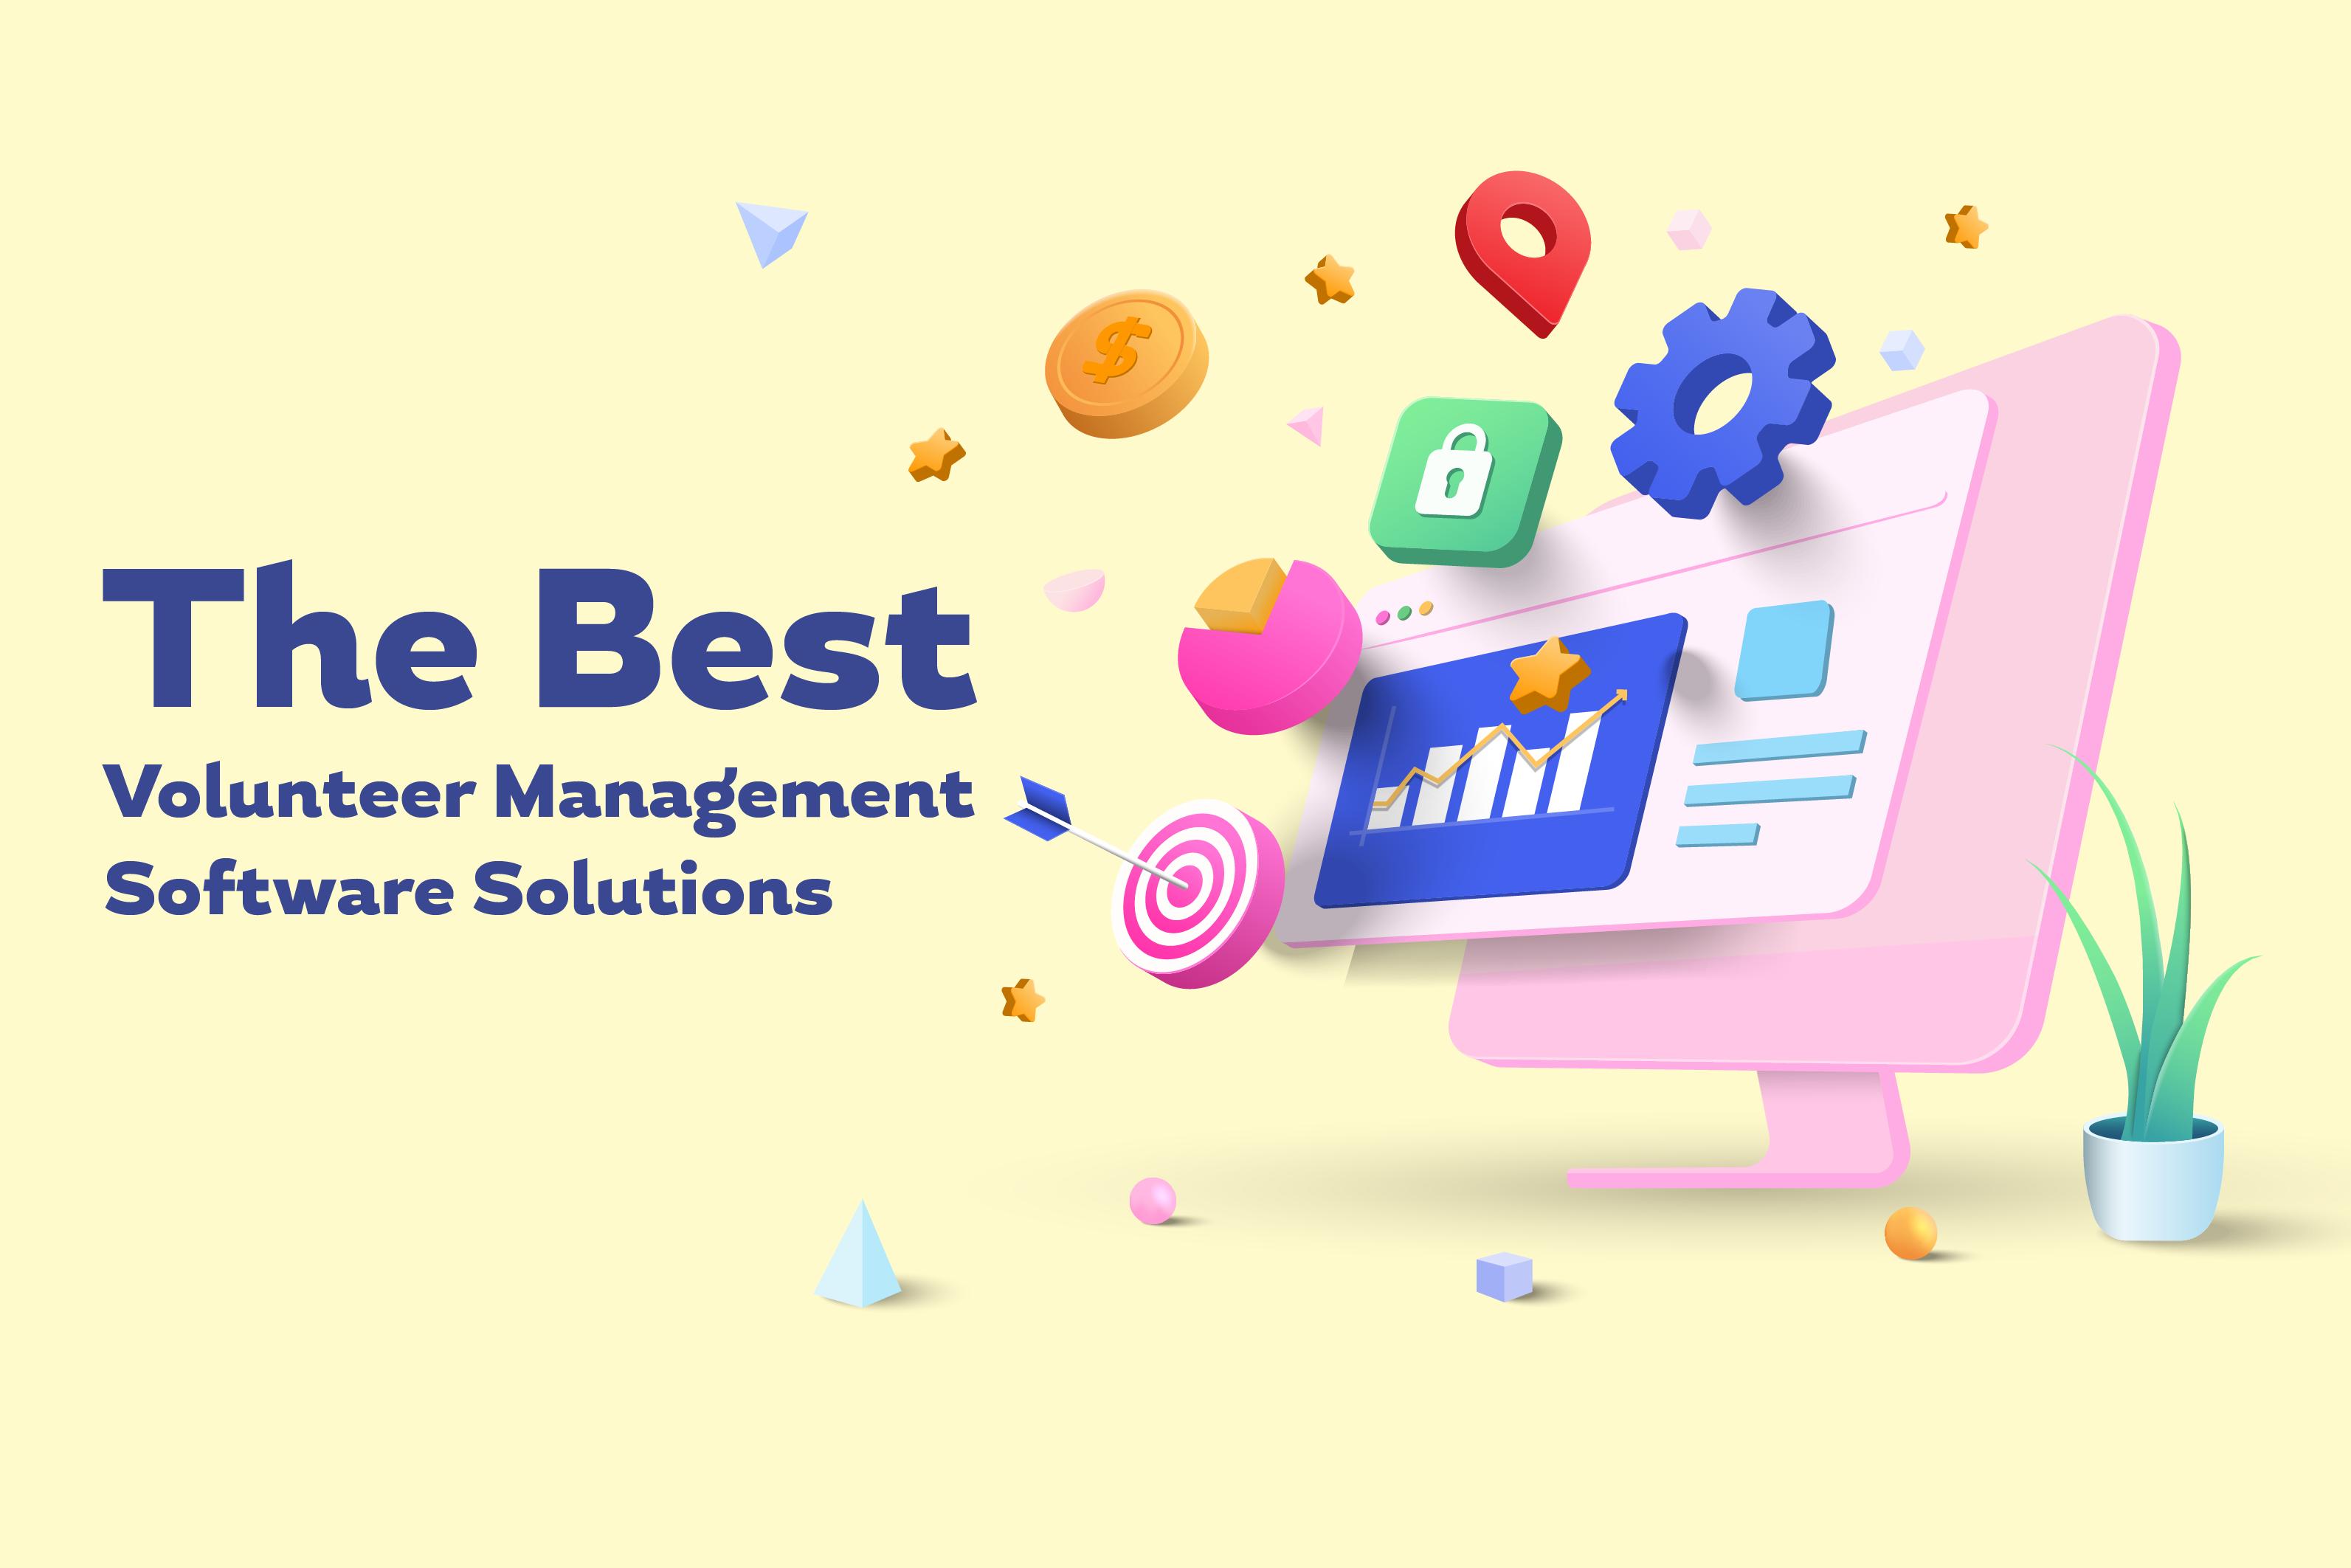 The Best Volunteer Management Software Solutions 2021